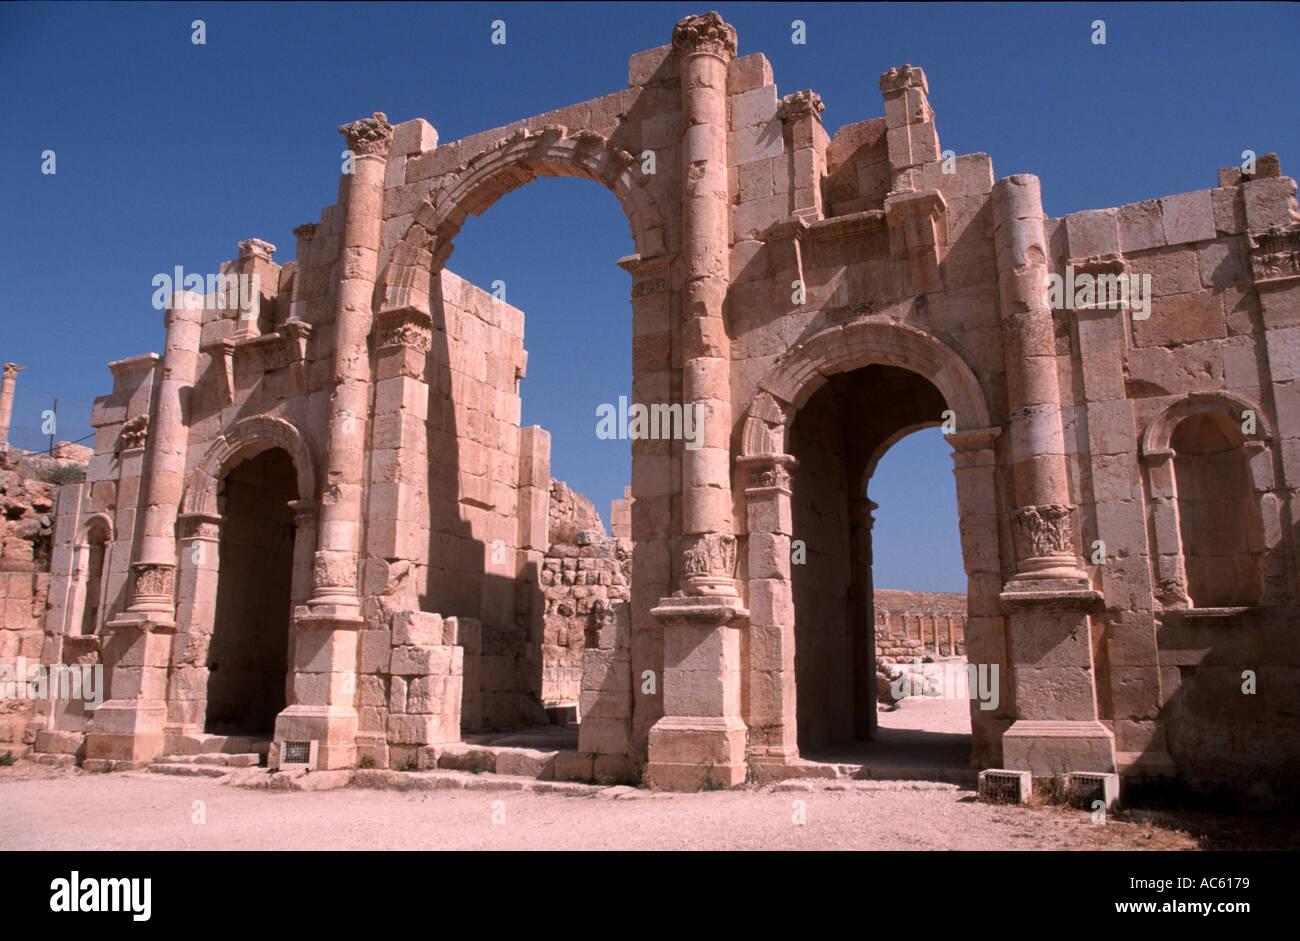 Triumphal Arch in Jerash Jordan - Stock Image